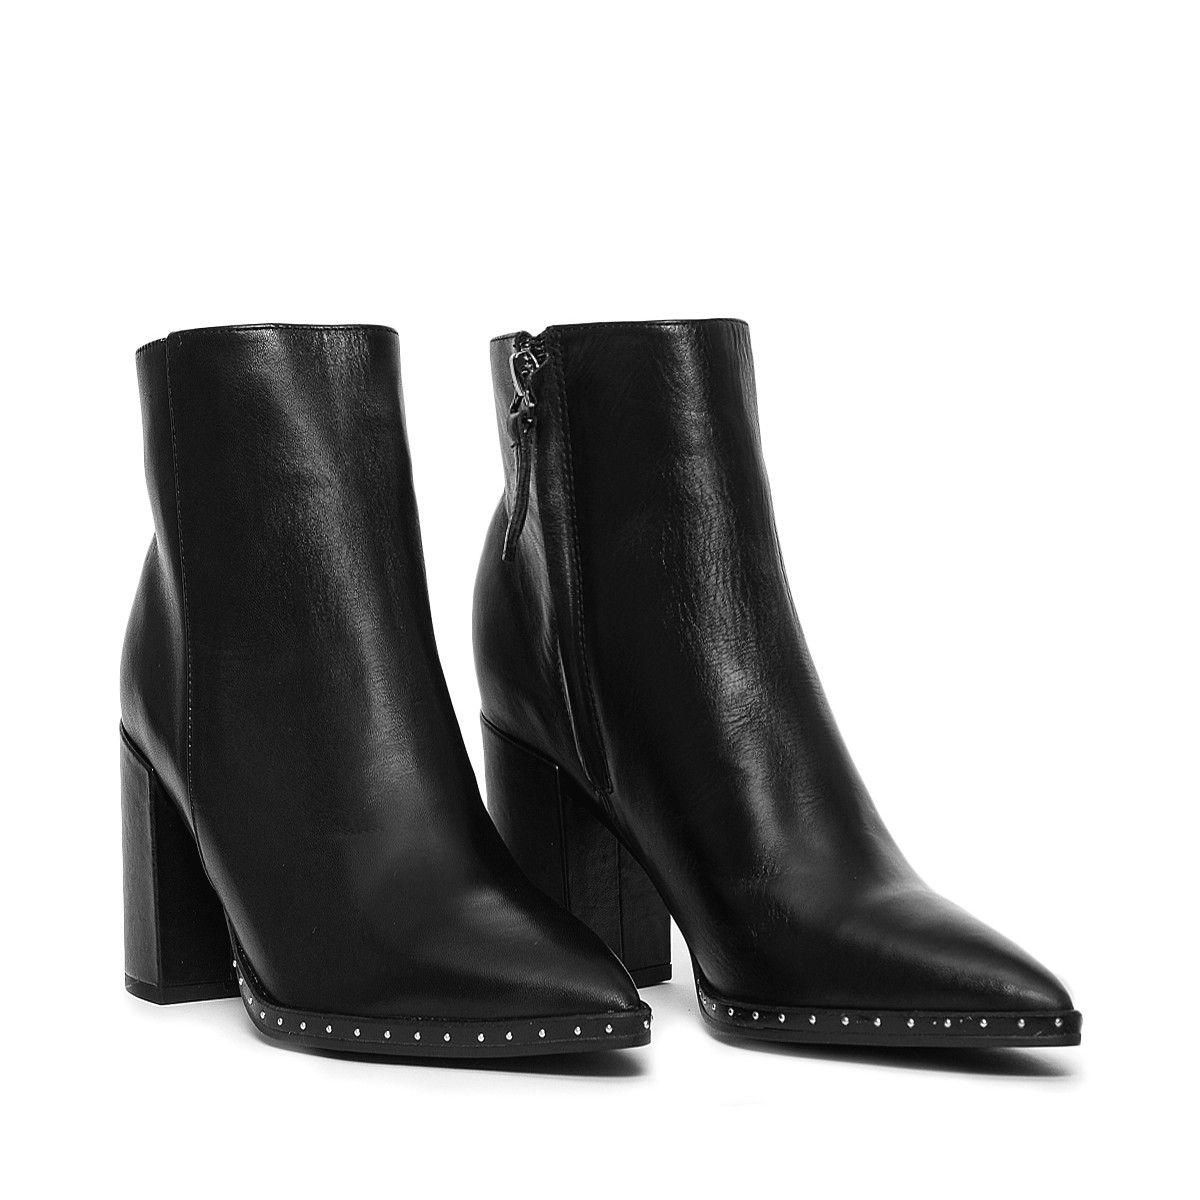 BAILEY Black Leather Tony Bianco